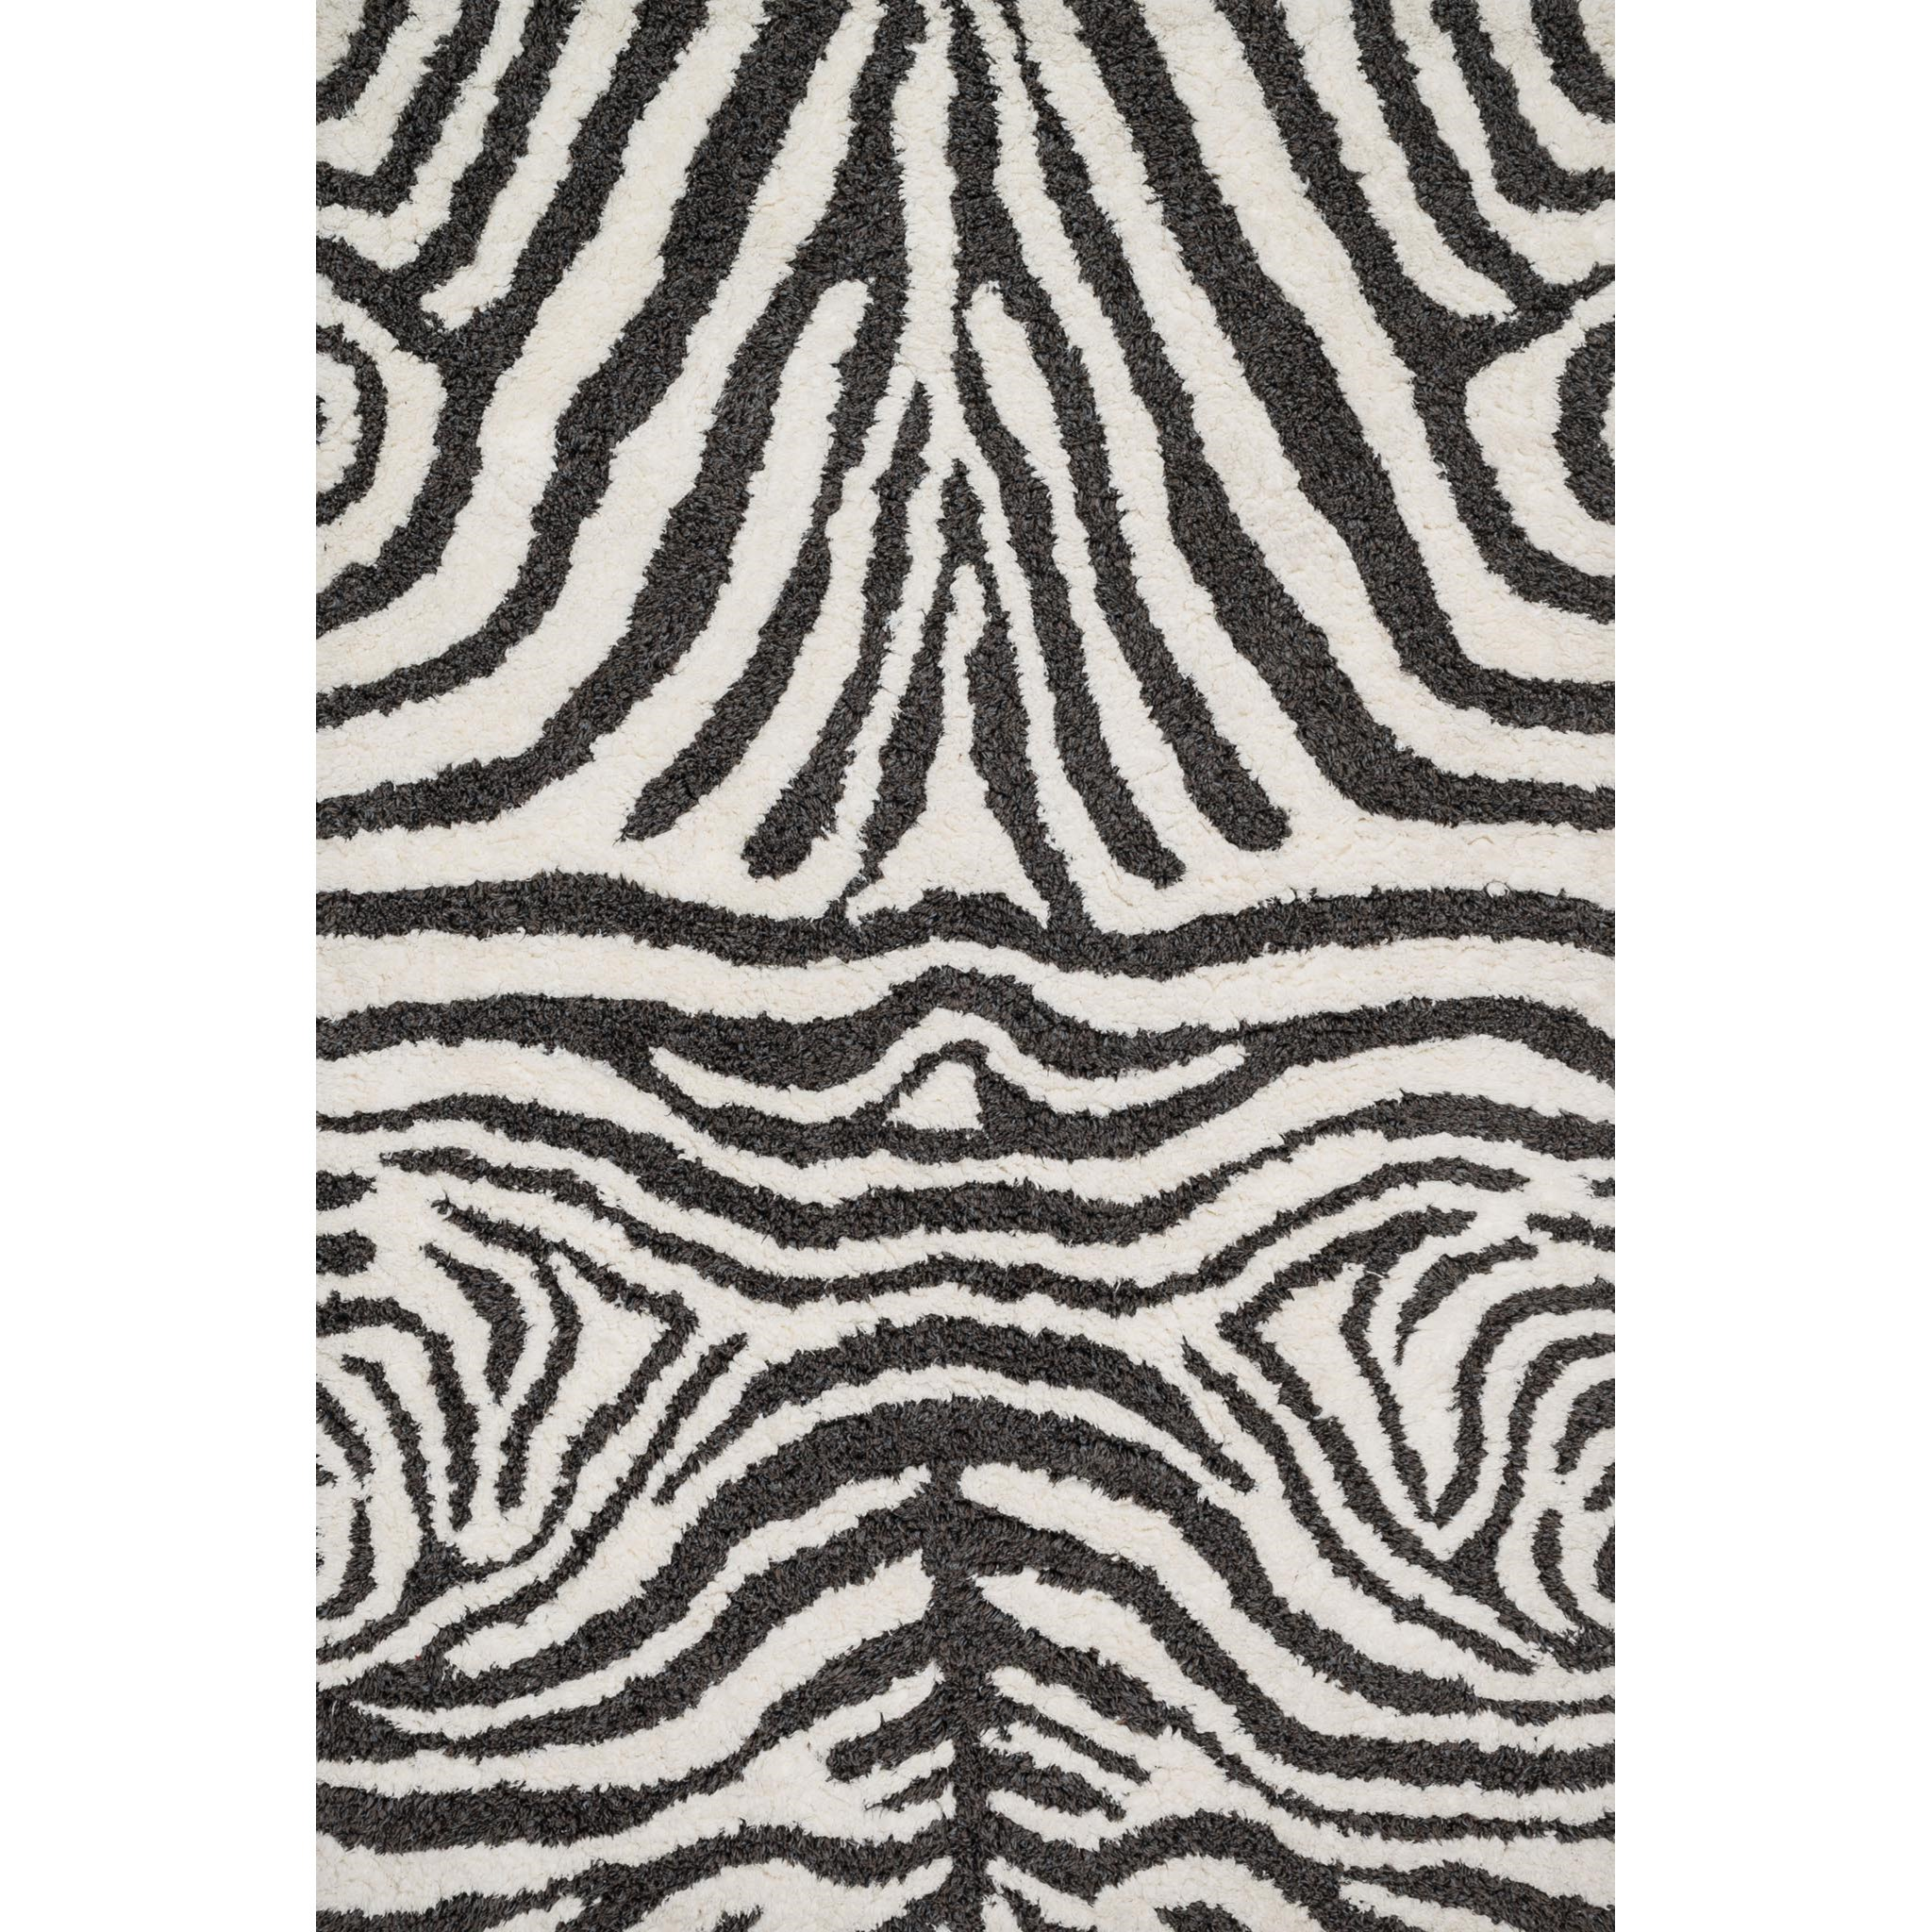 "Kiara Shag 7'-9"" x 9'-9"" Area Rug by Loloi Rugs at Sprintz Furniture"